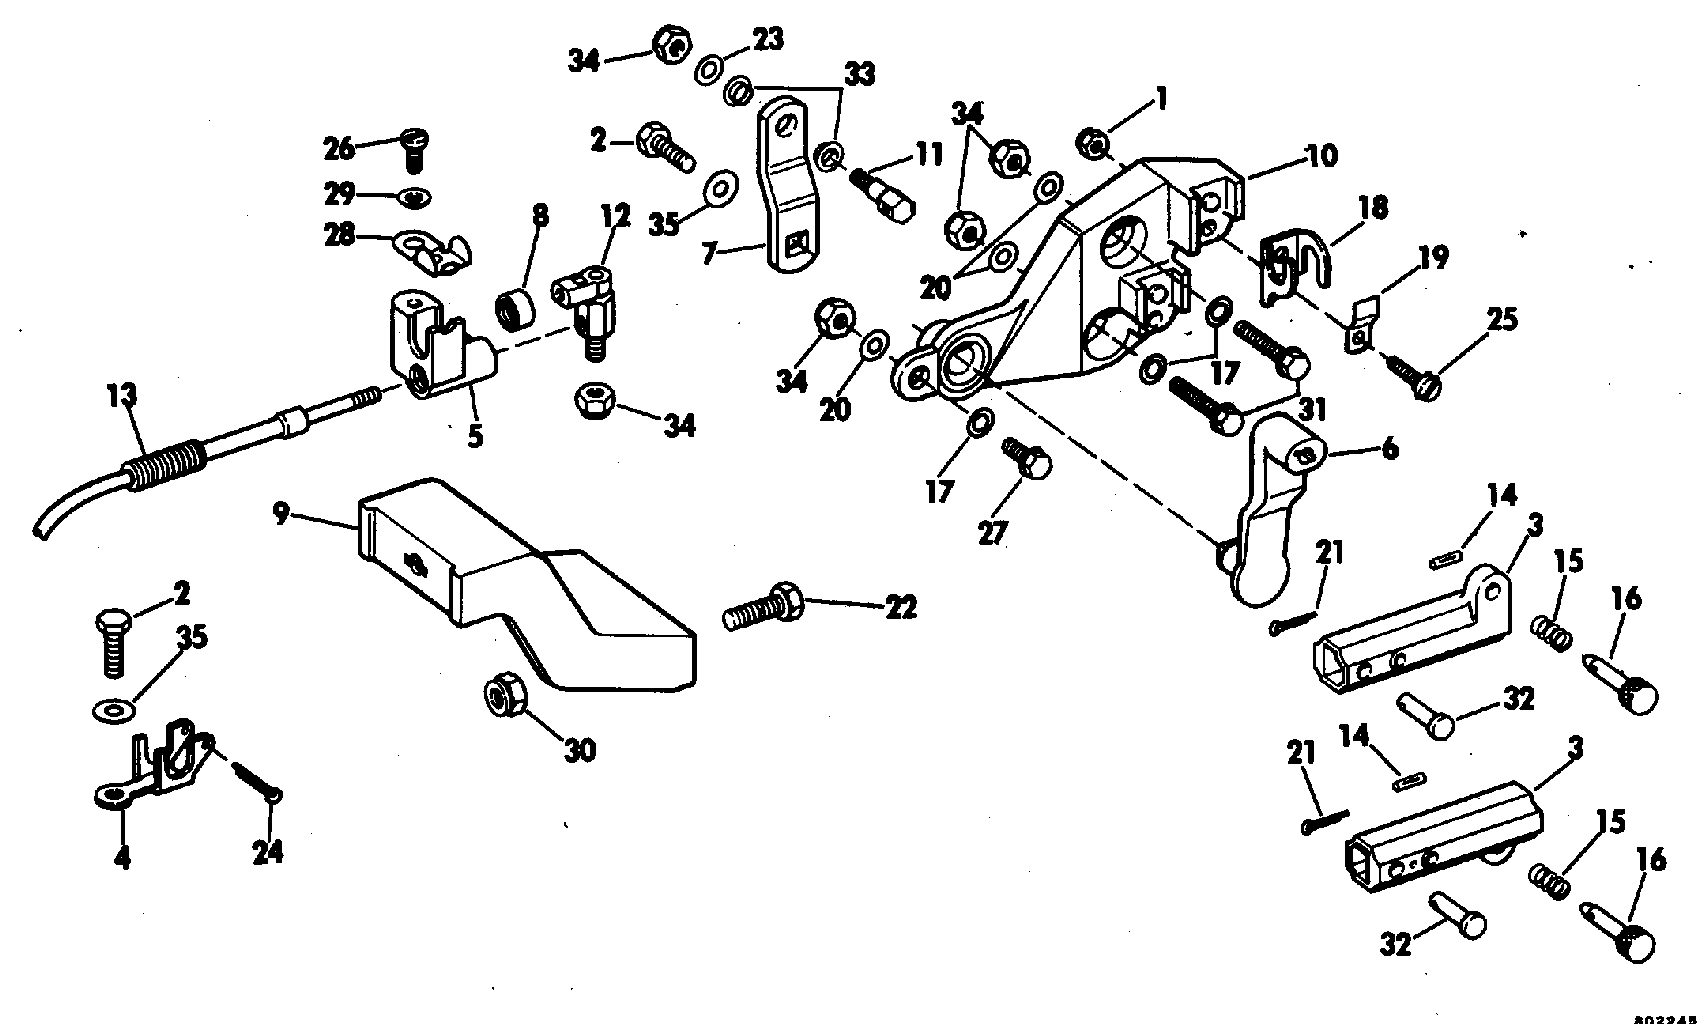 Remote Control Adaptor Kit 7.5 Remote Control 1981